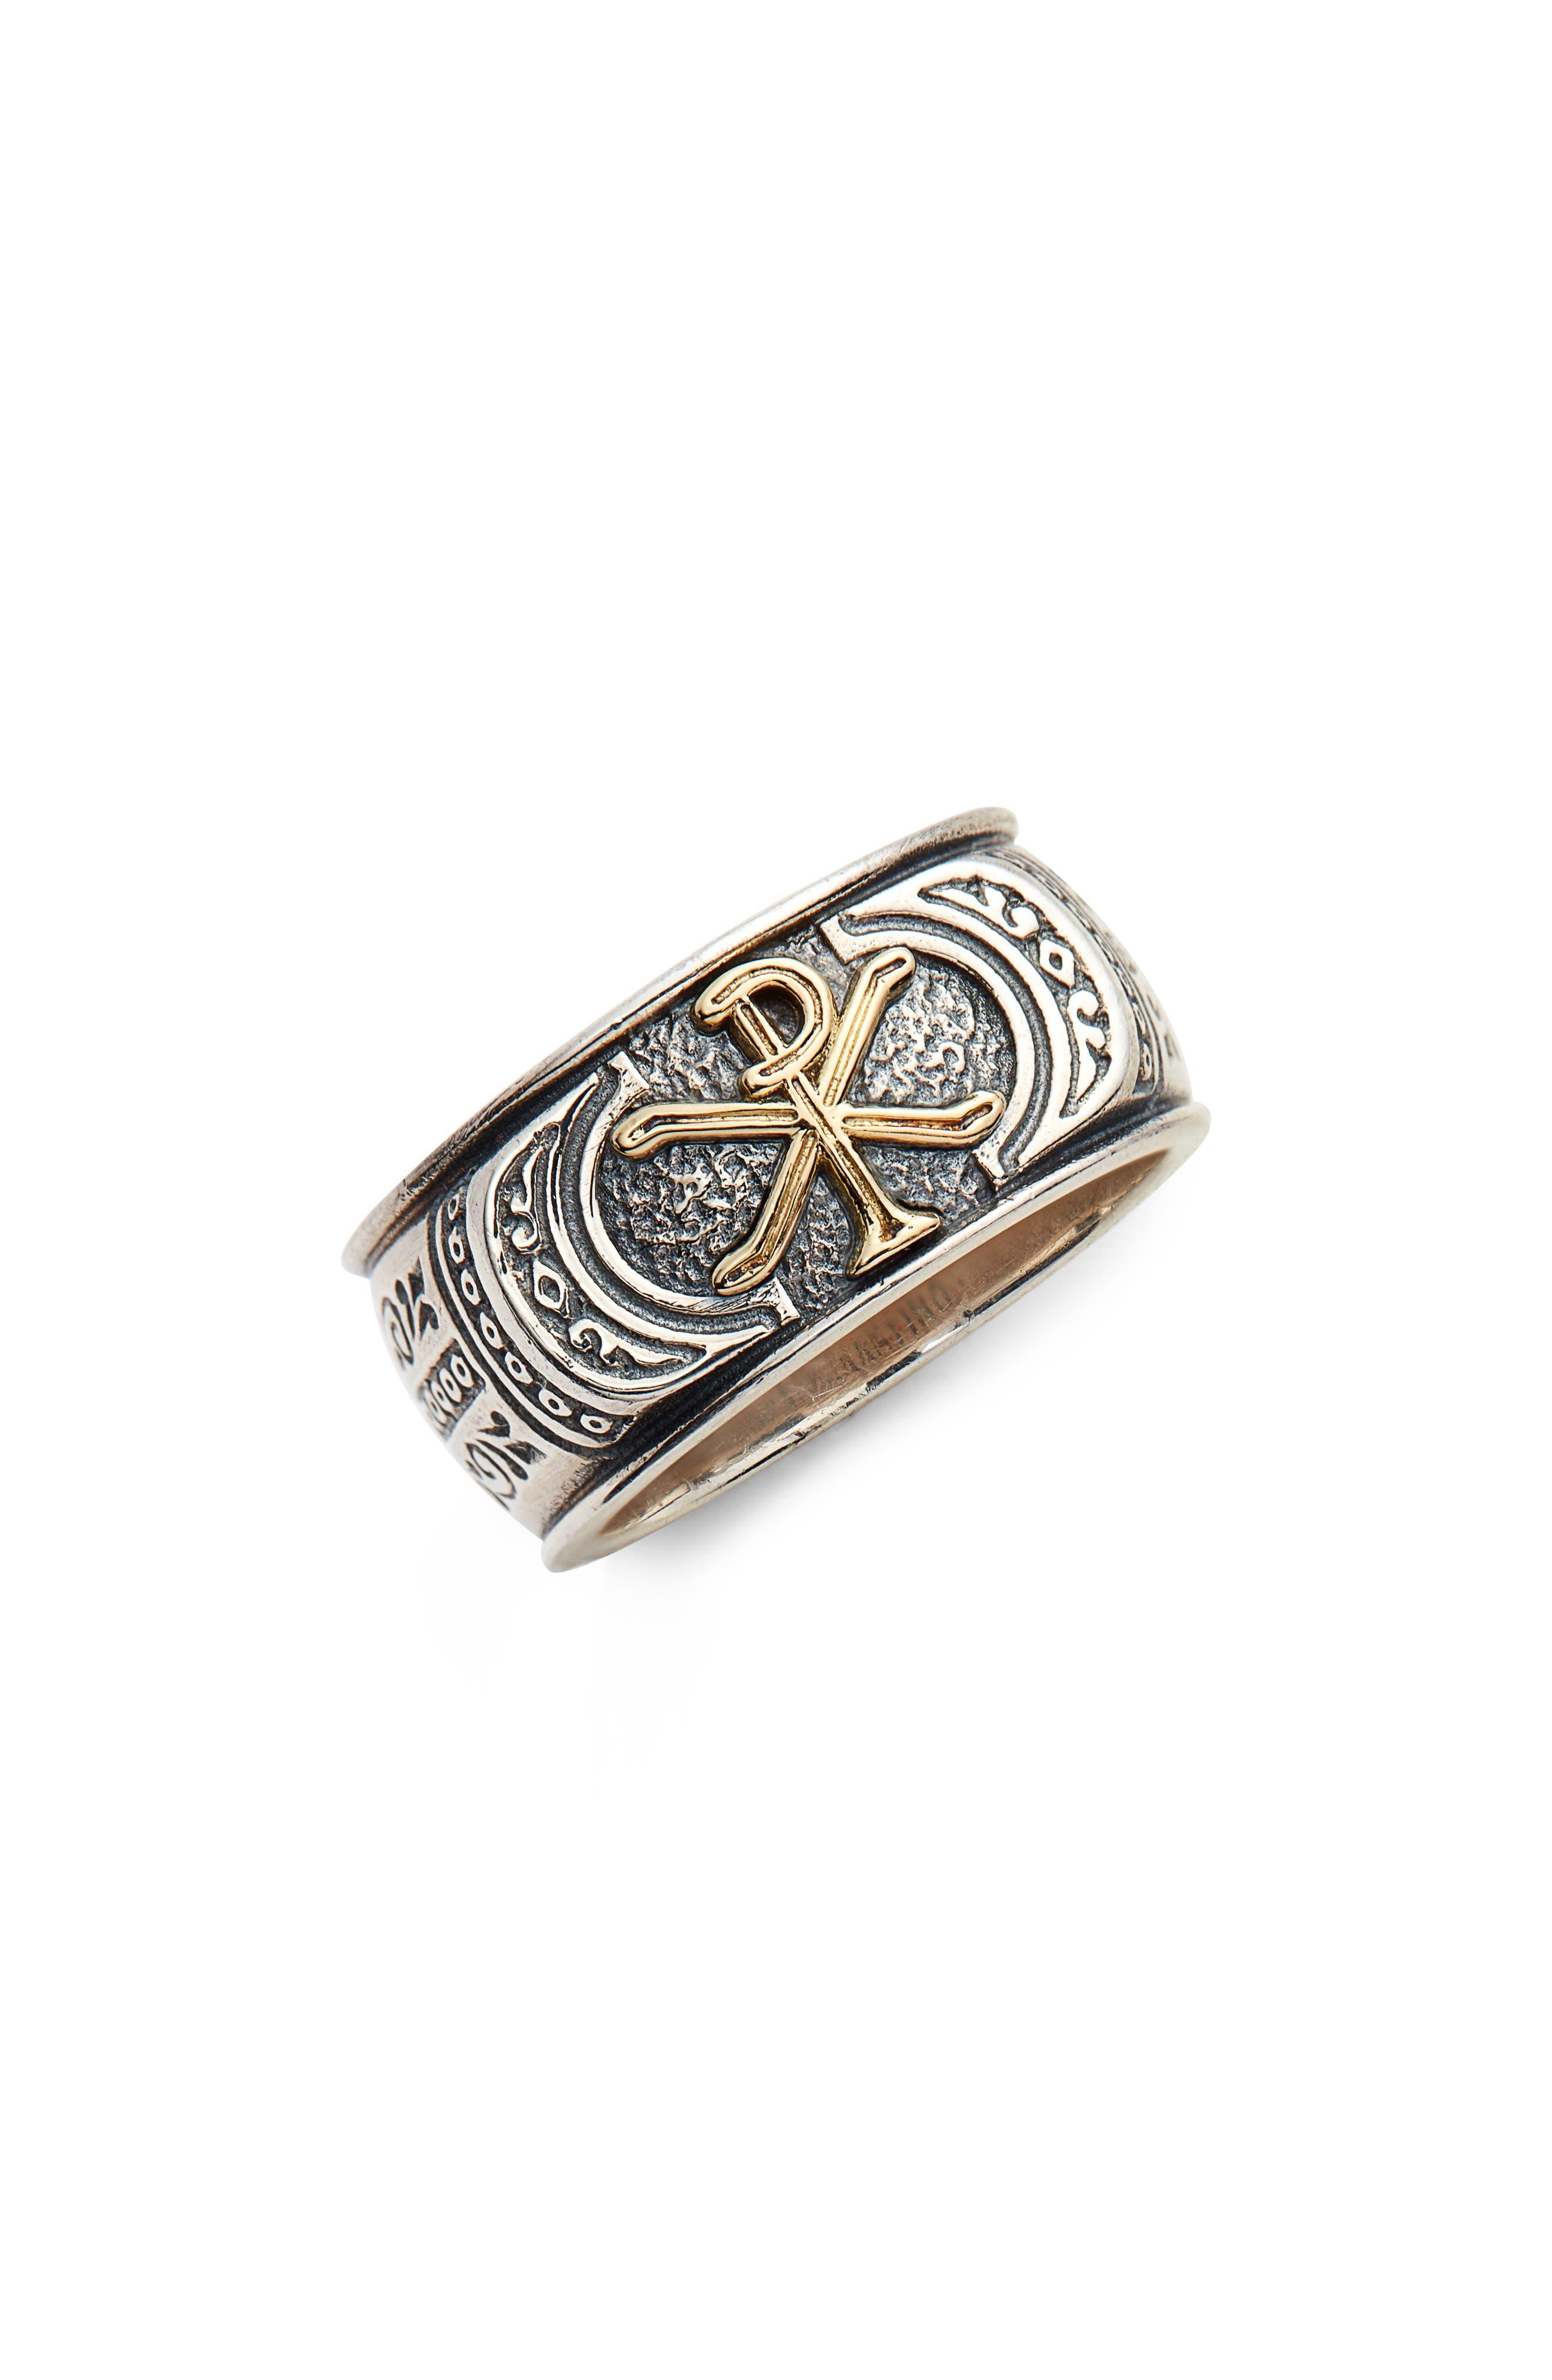 Stavros Band Ring,                             Main thumbnail 1, color,                             Silver/ Gold